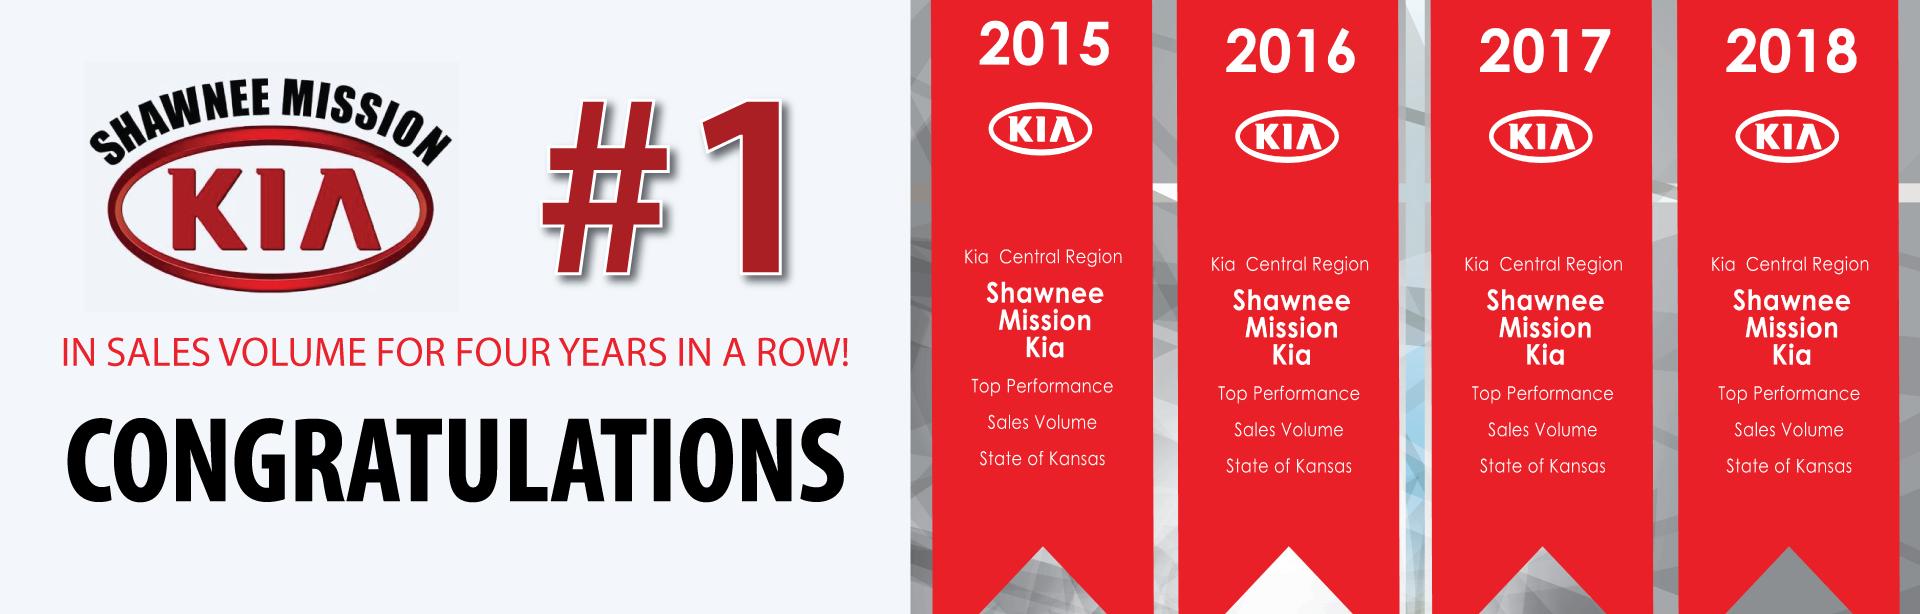 Shawnee Mission Kia | Local Kia Car Dealership Serving Kansas City